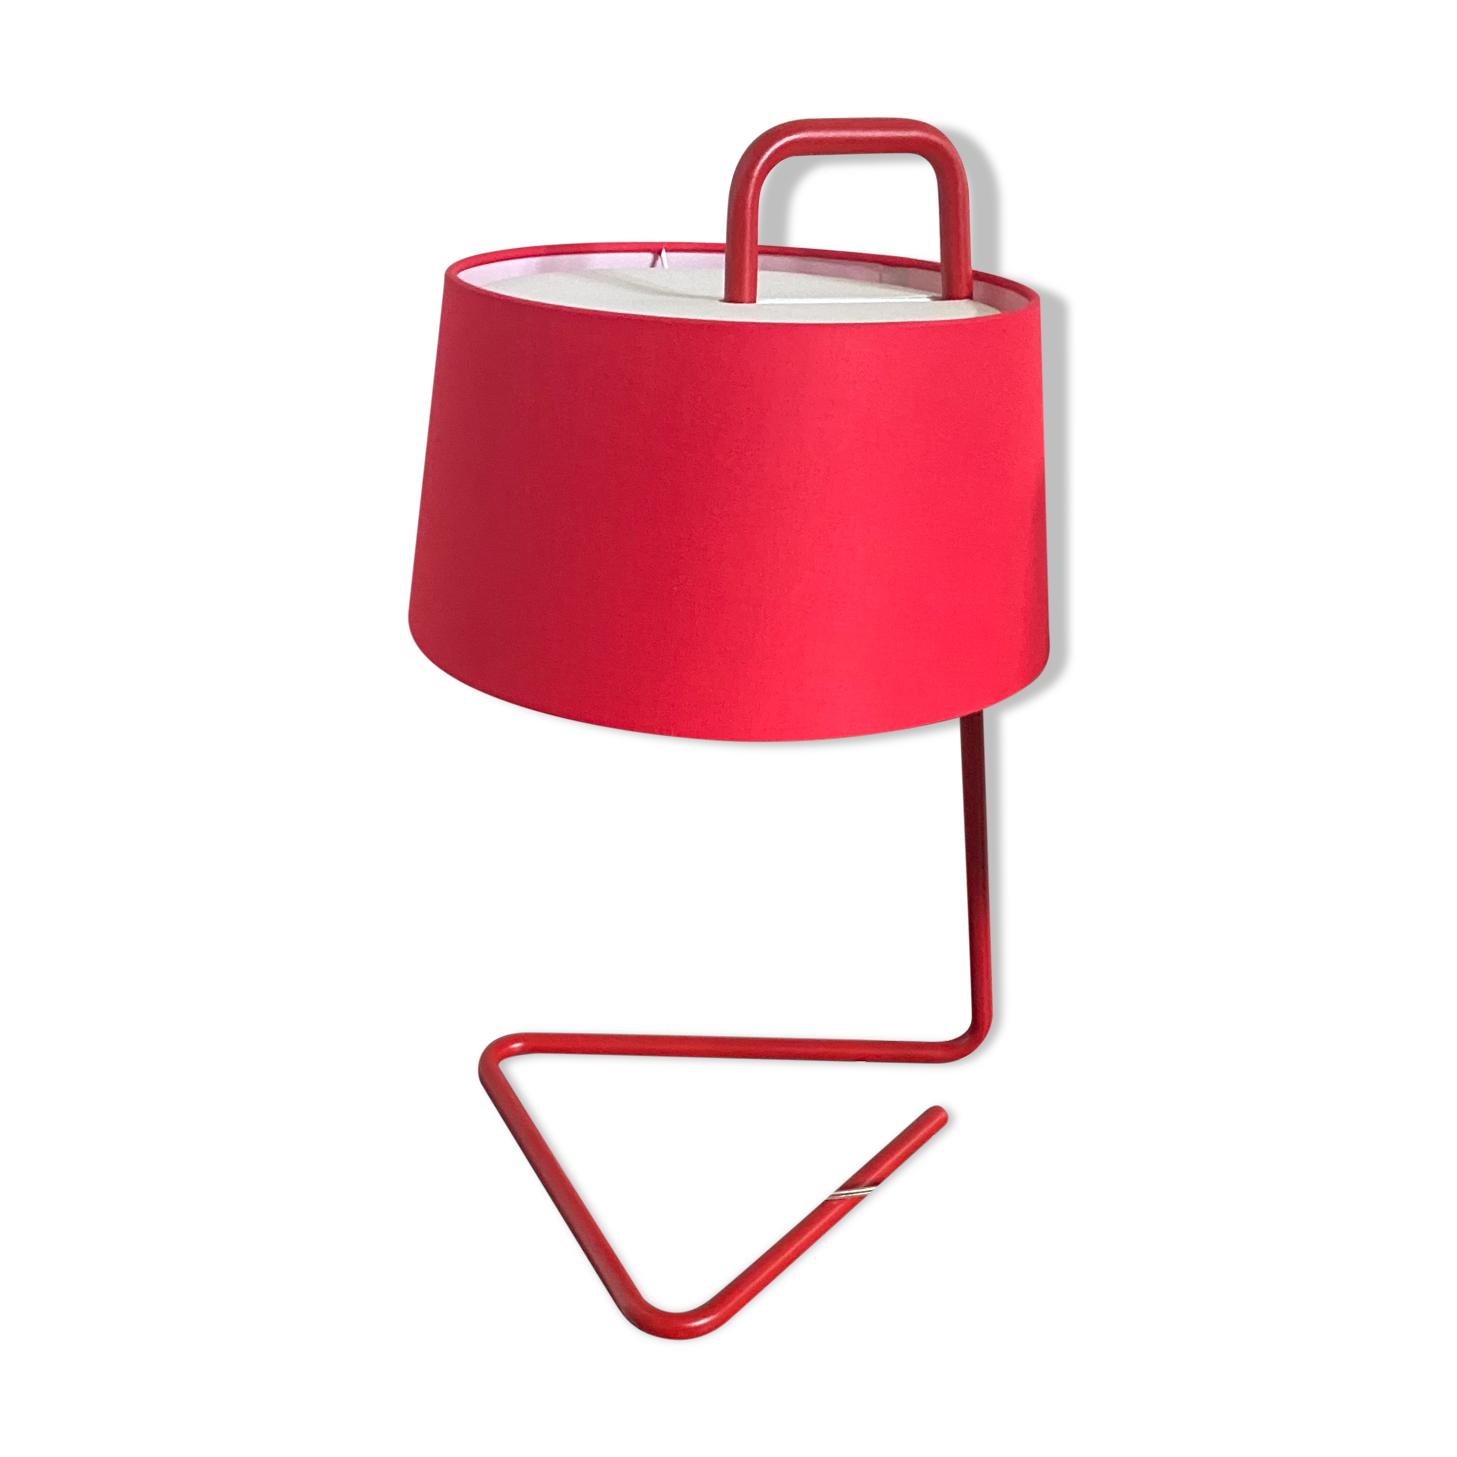 Lampe de table sextans Calligaris